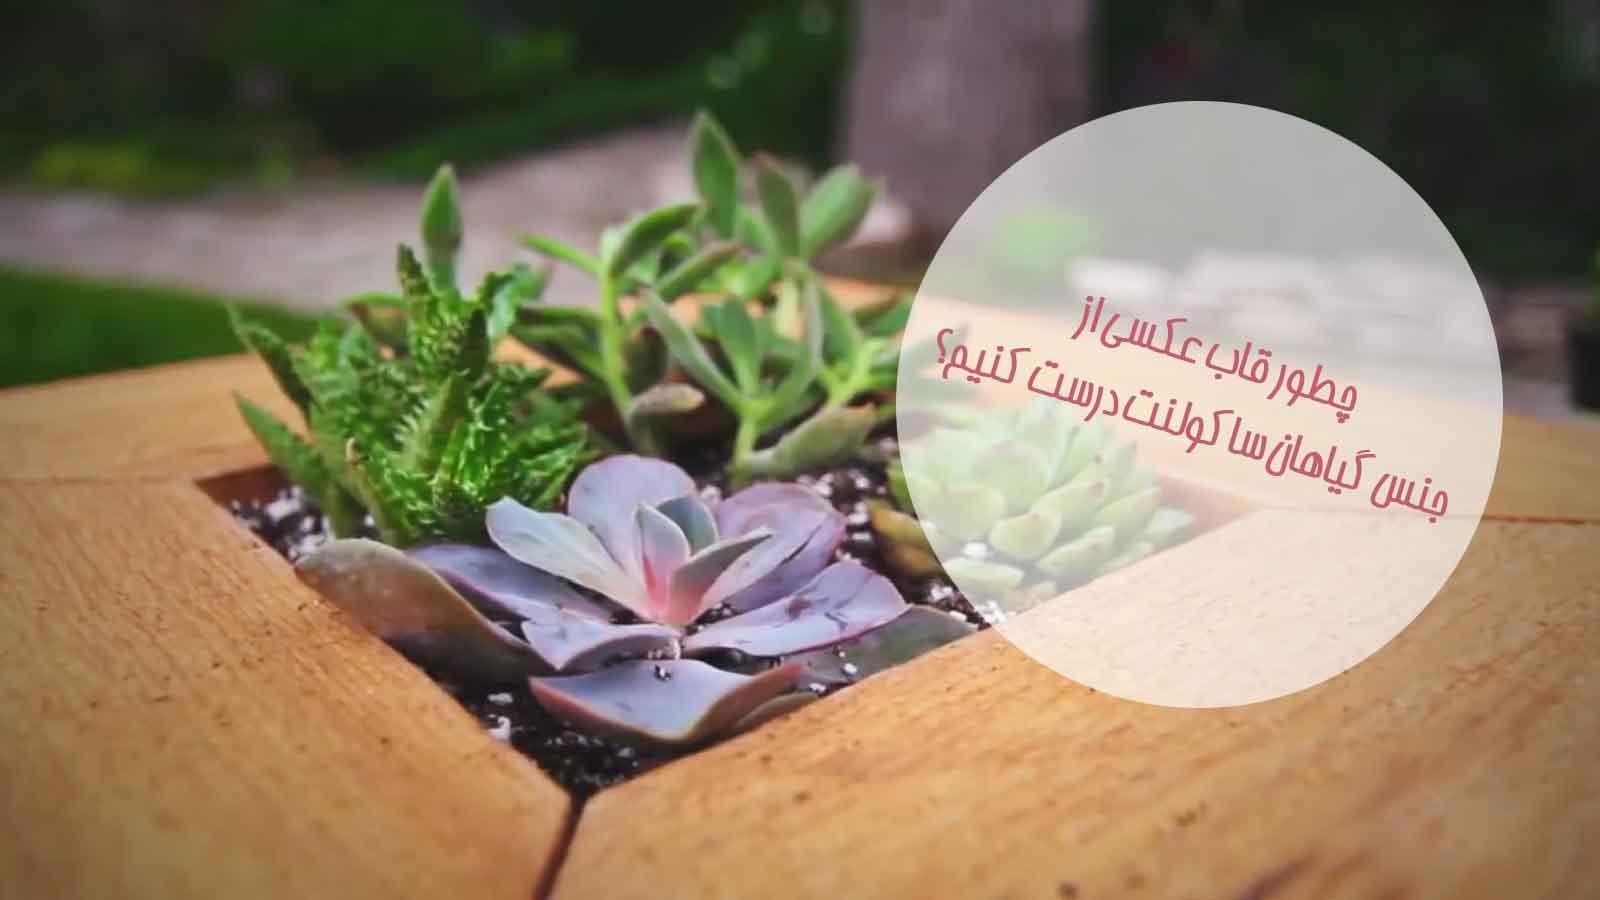 قاب عکسی از جنس گیاهان ساکولنت